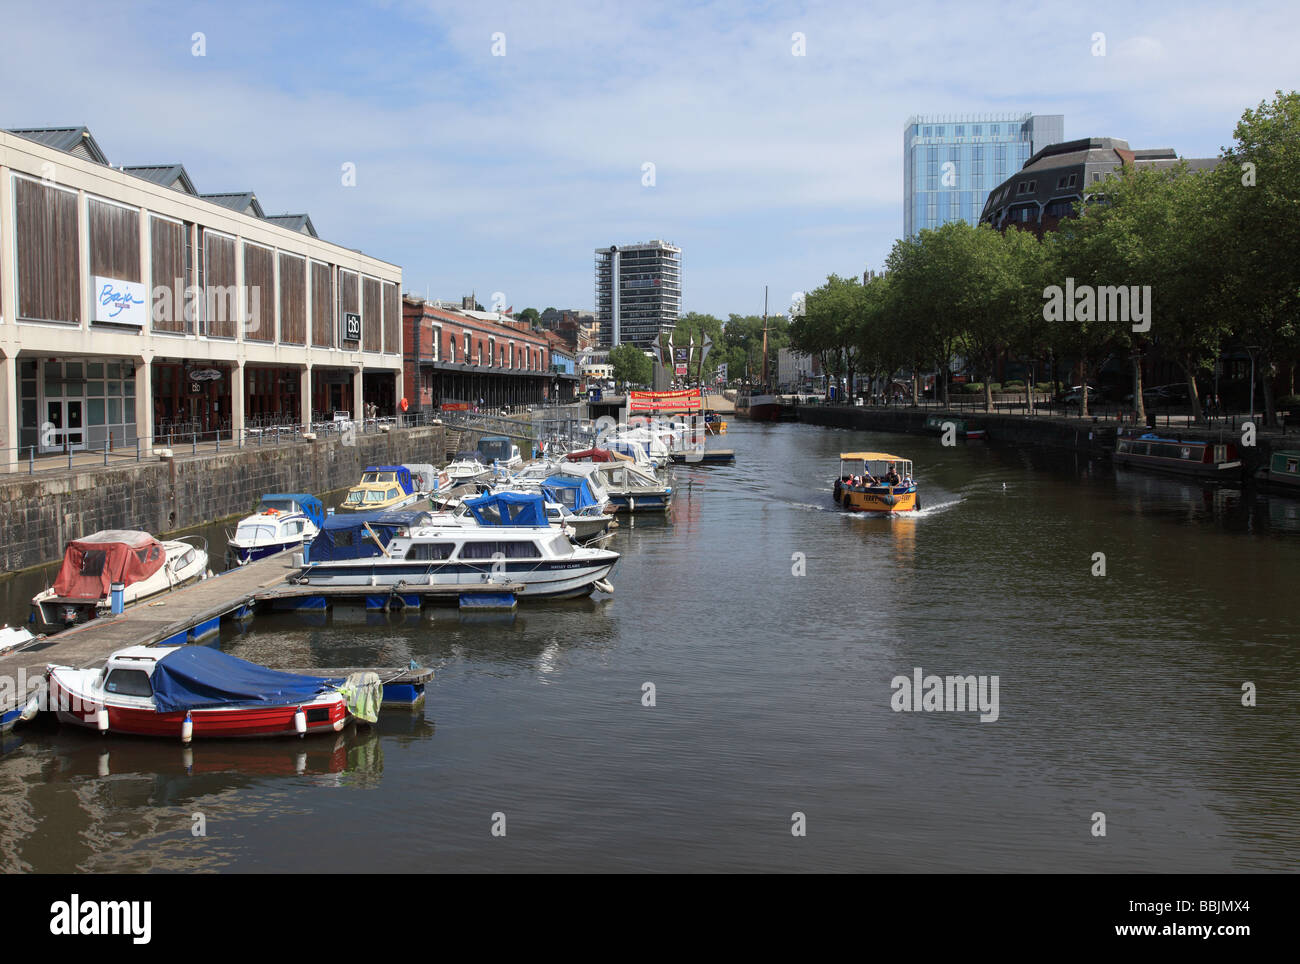 Bristol Harbourside, England - Stock Image